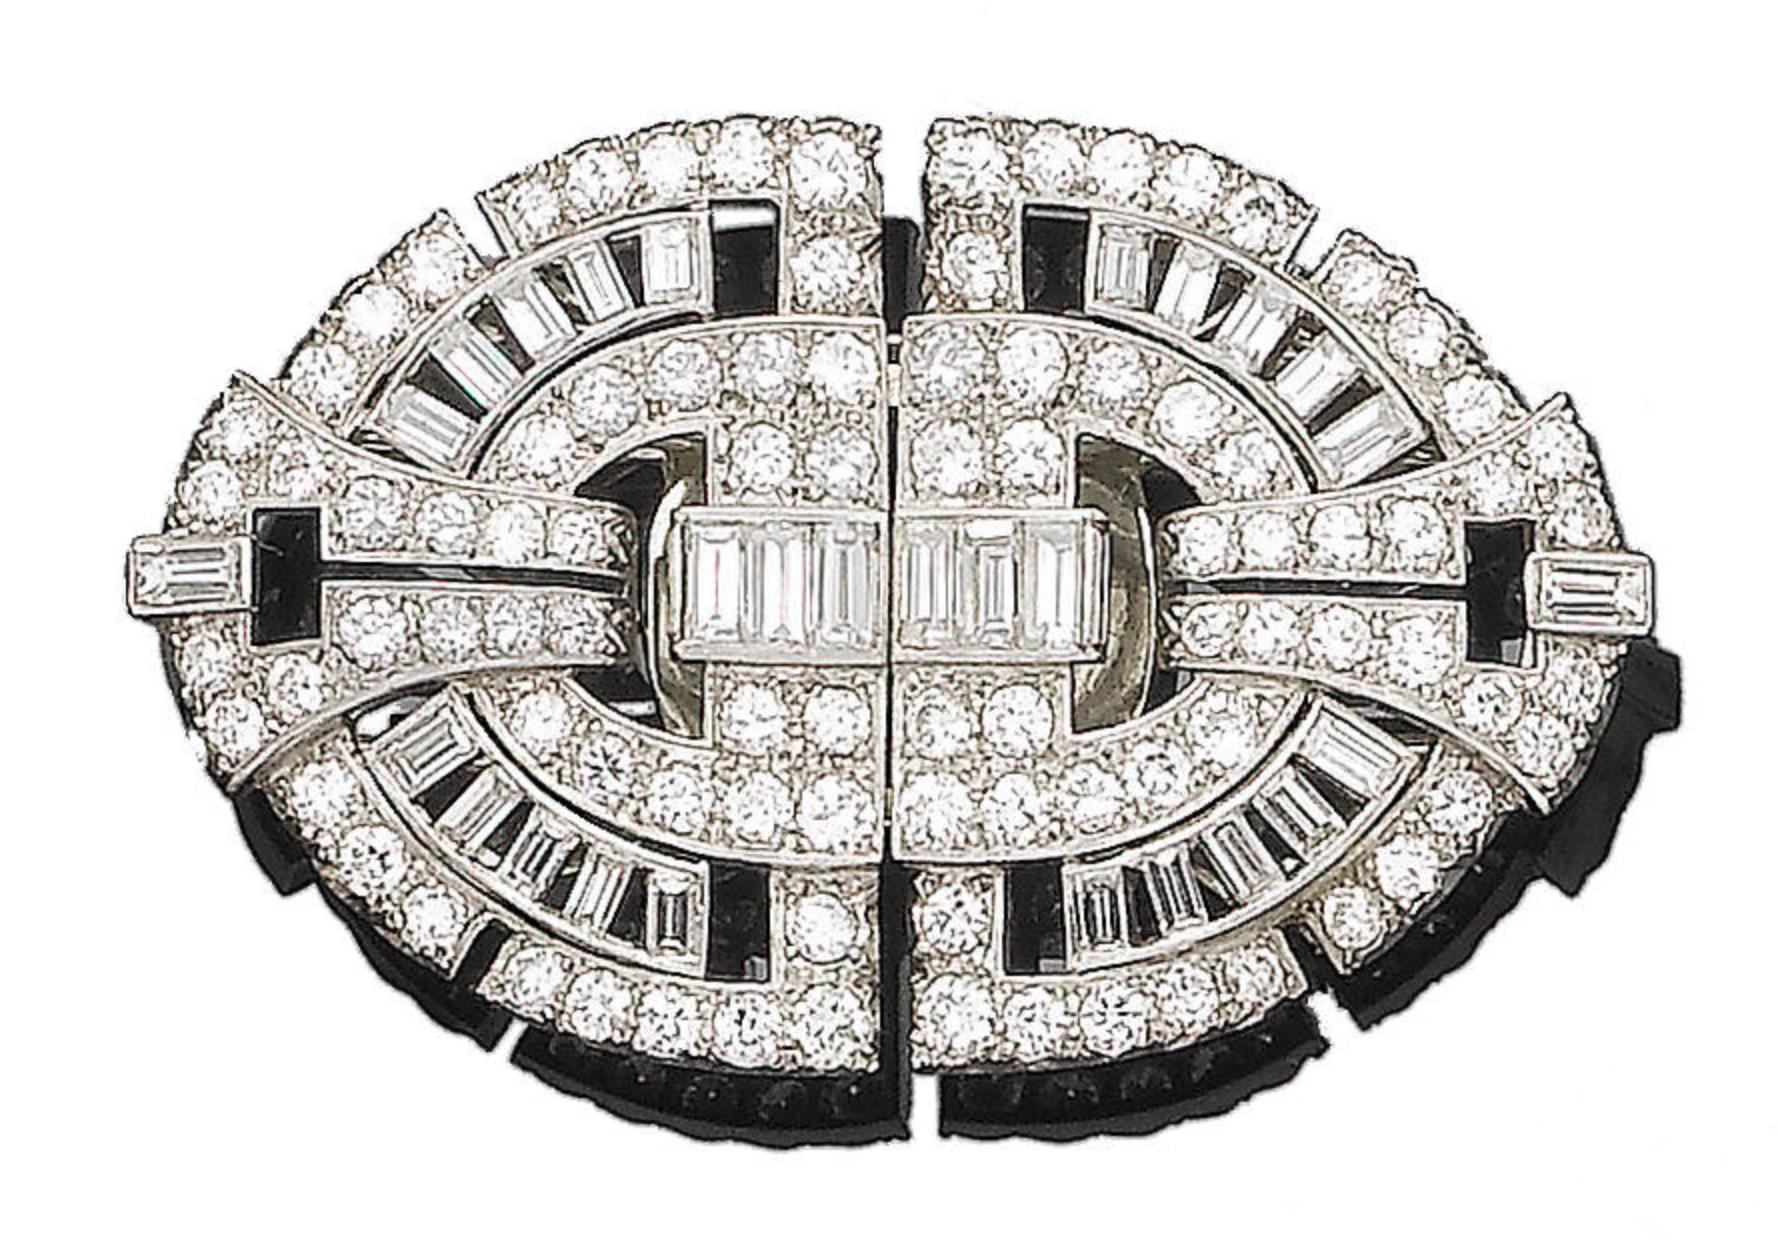 A diamond double-clip brooch Of geometric design, each openwork plaque set with graduated brilliant, old brilliant and baguette-cut diamonds